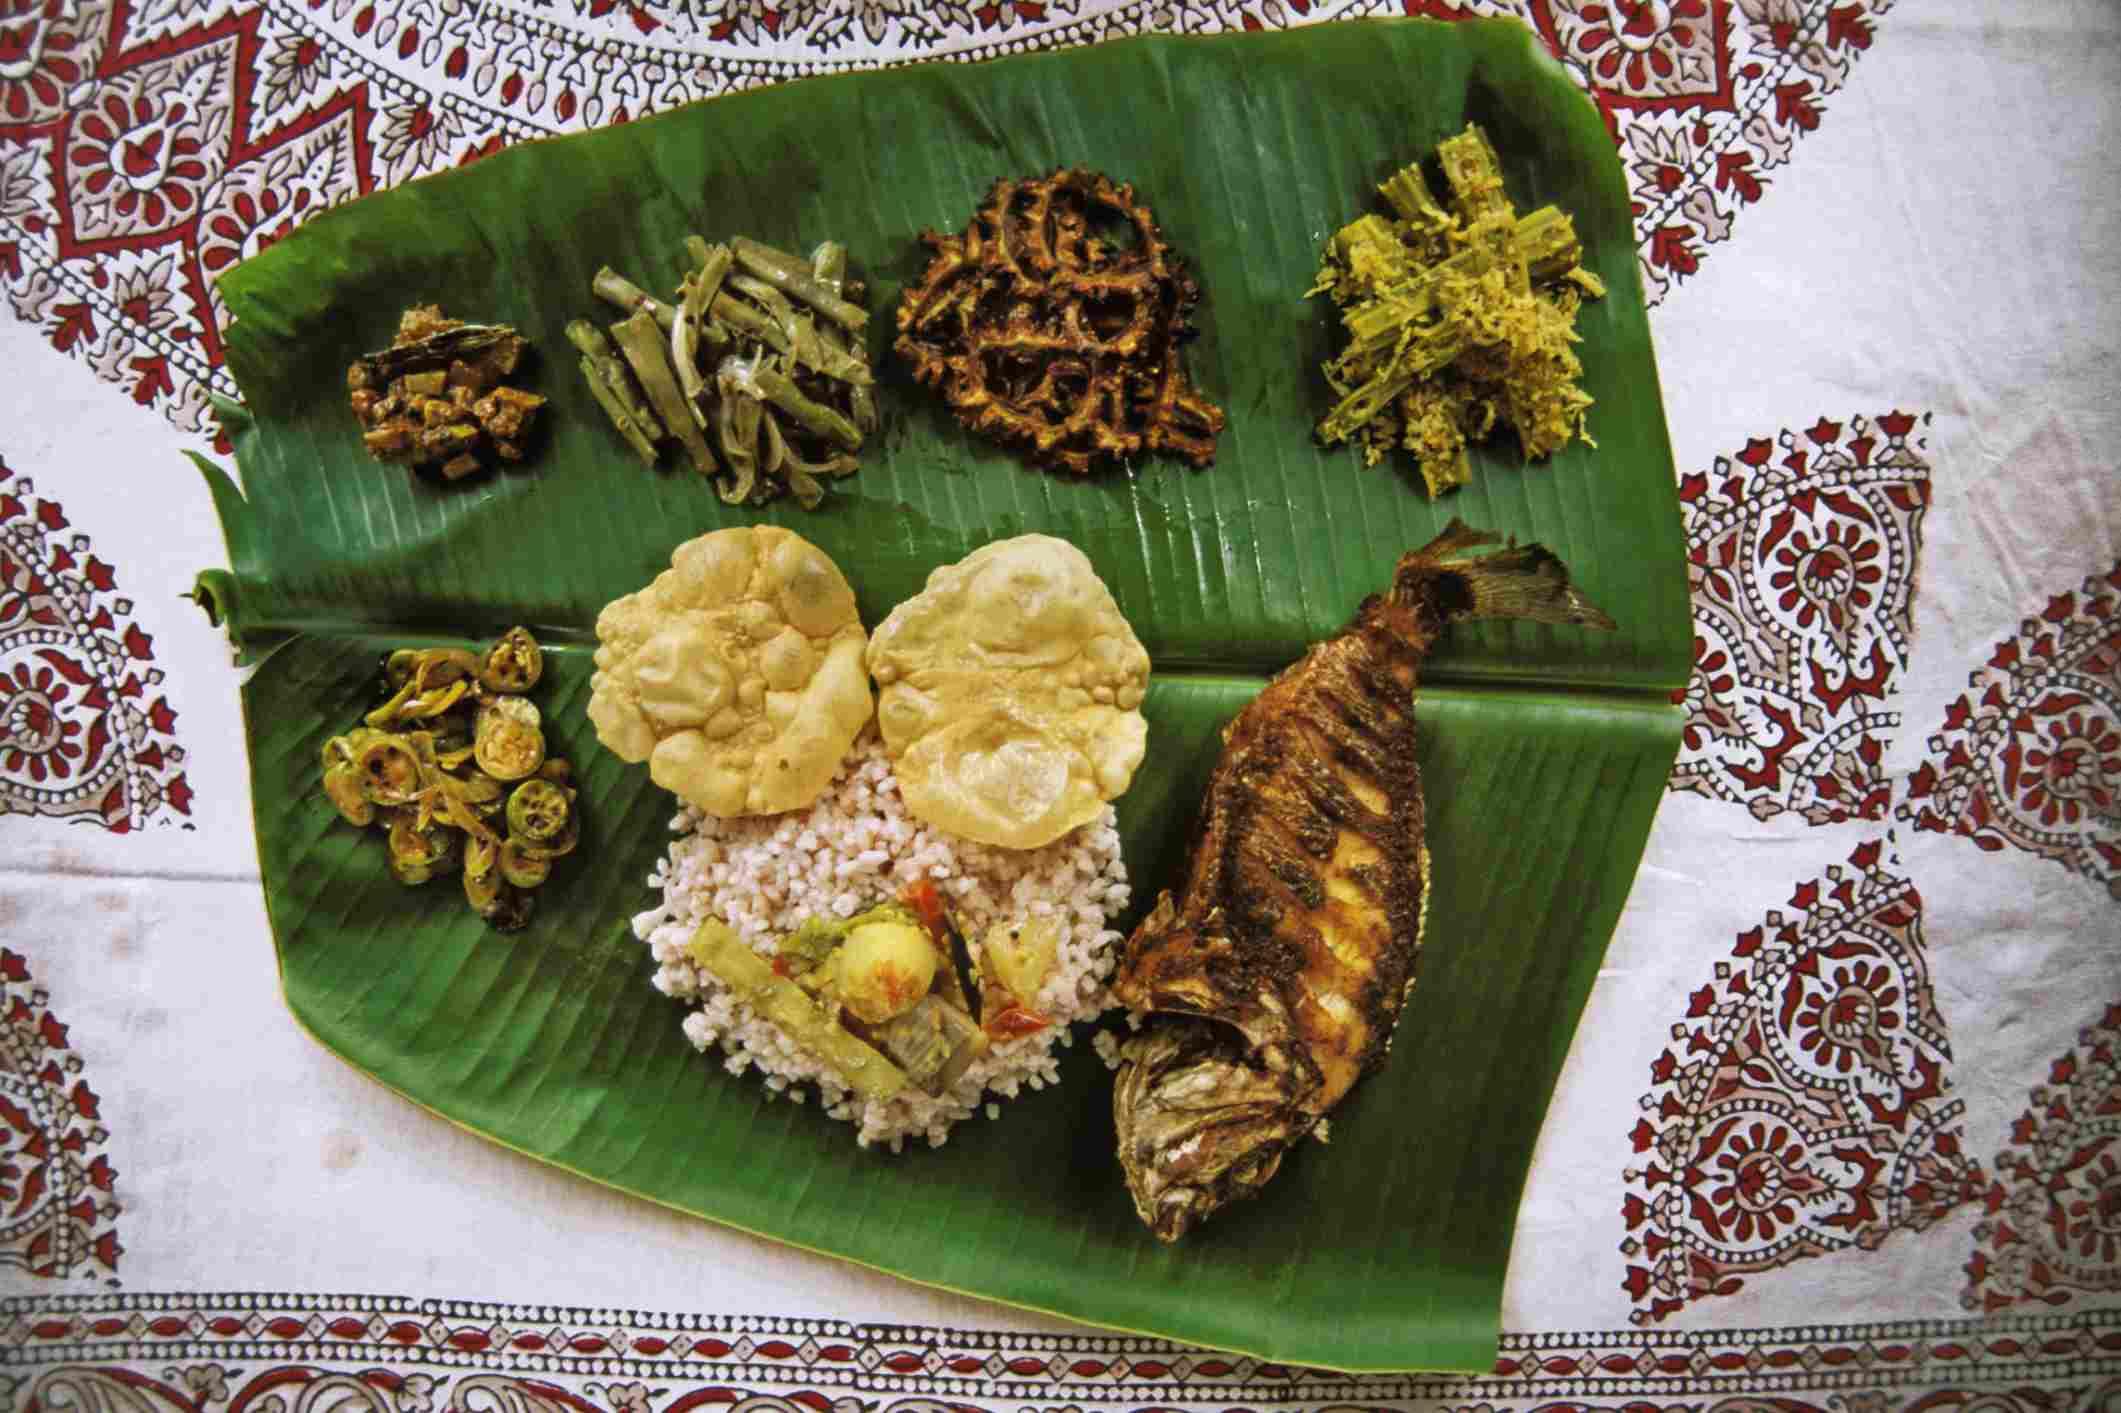 Kerala cuisine, served on a banana leaf.